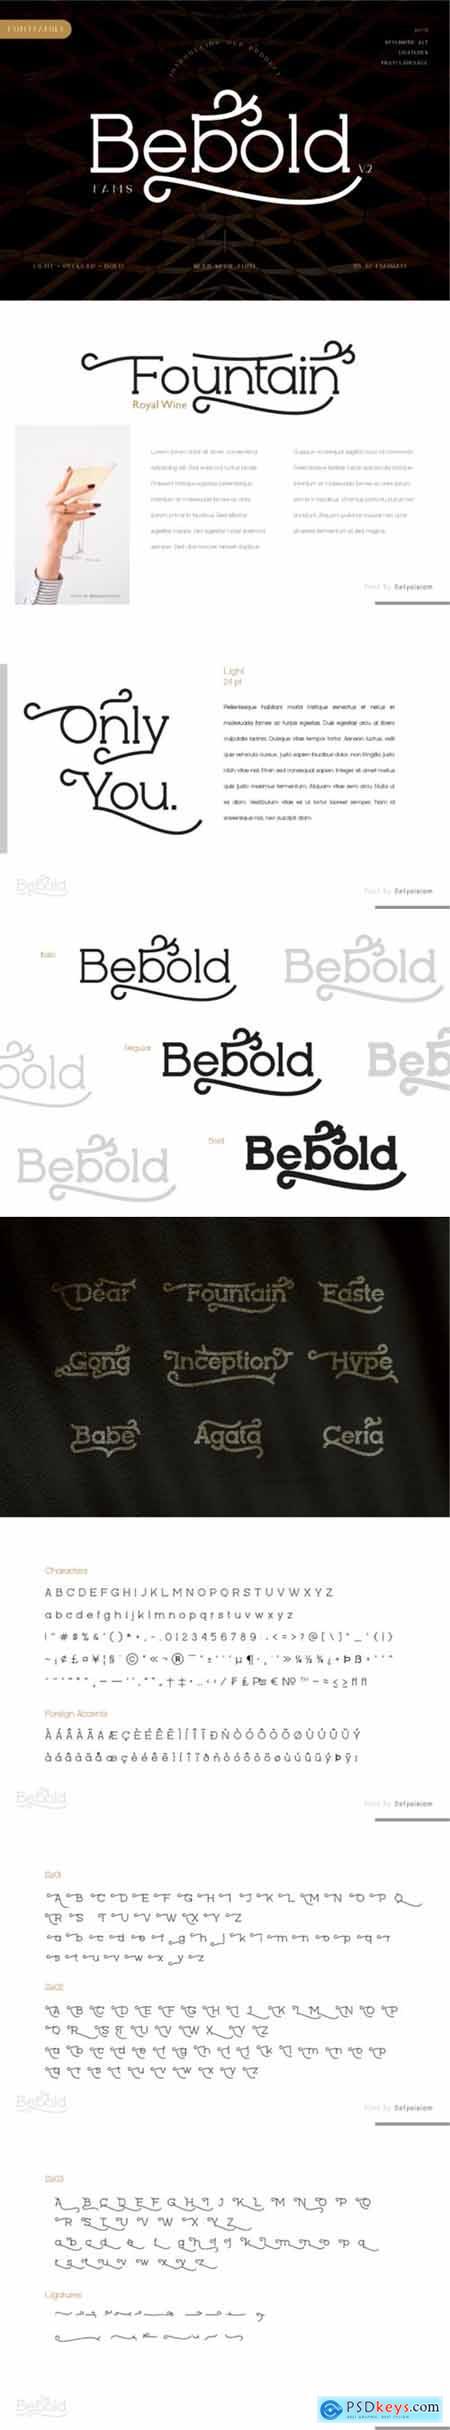 Bebold Font